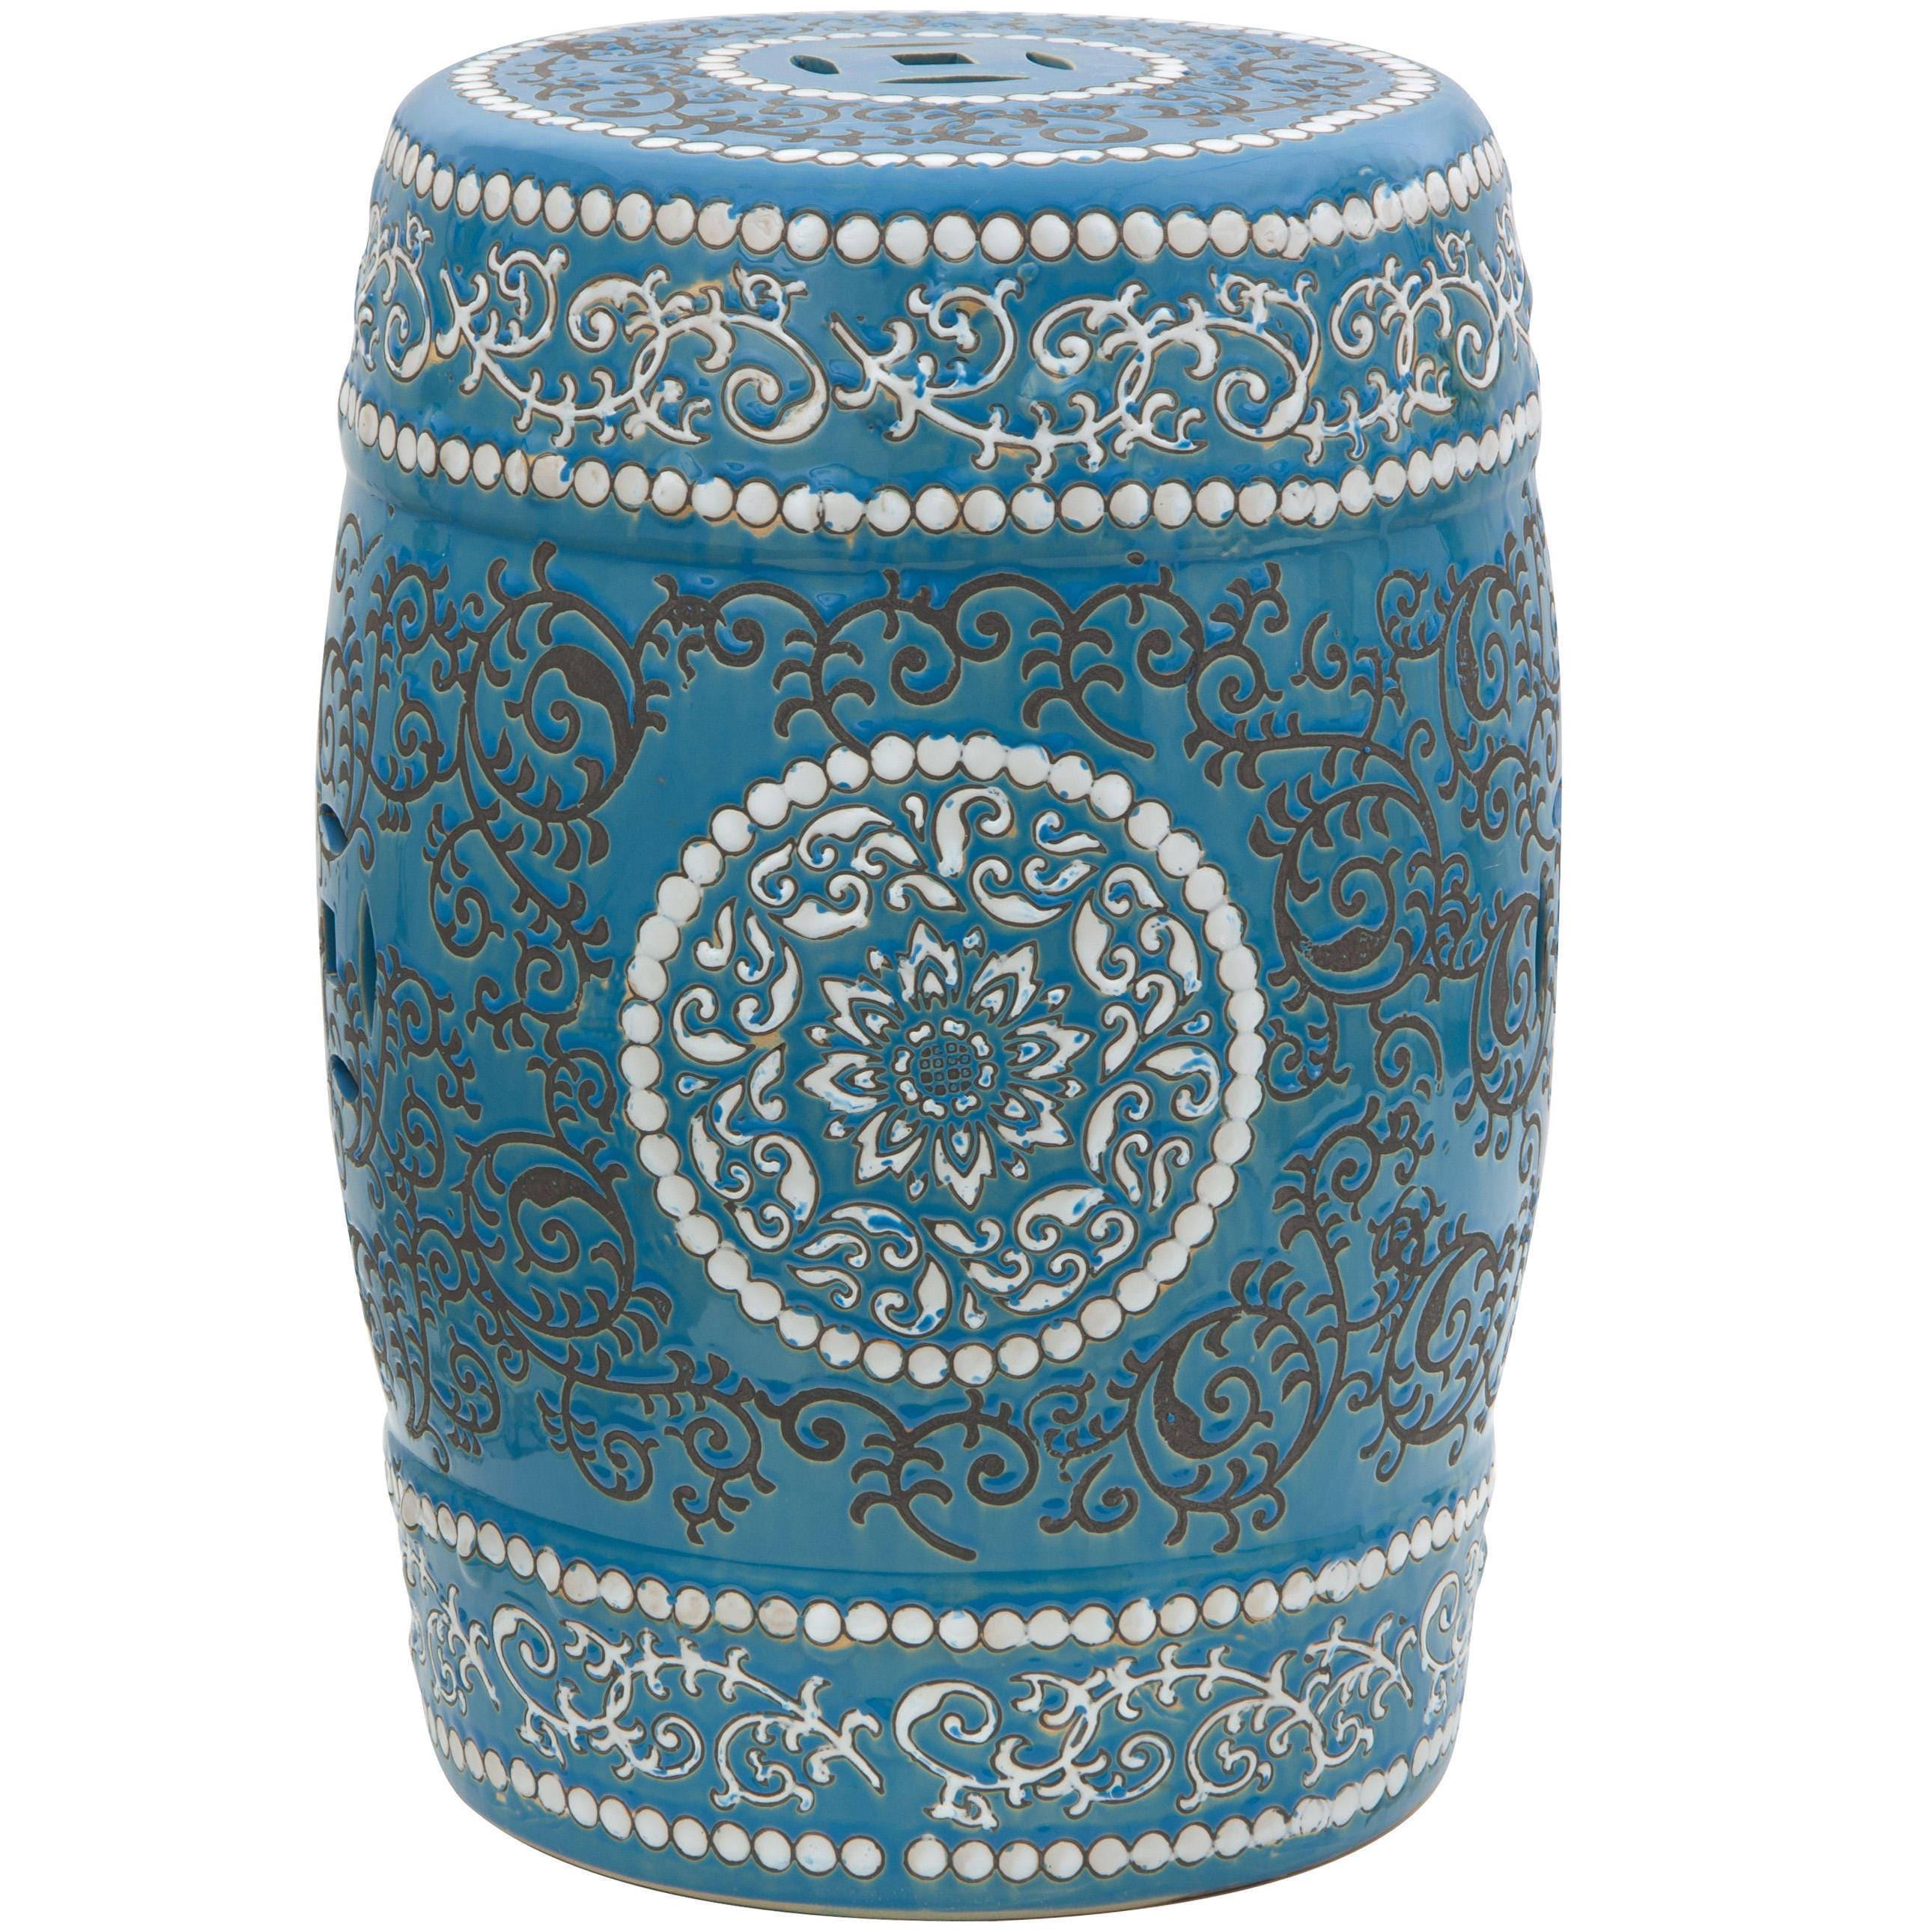 Genial Handmade Blue Medallion Porcelain Garden Stool (China)